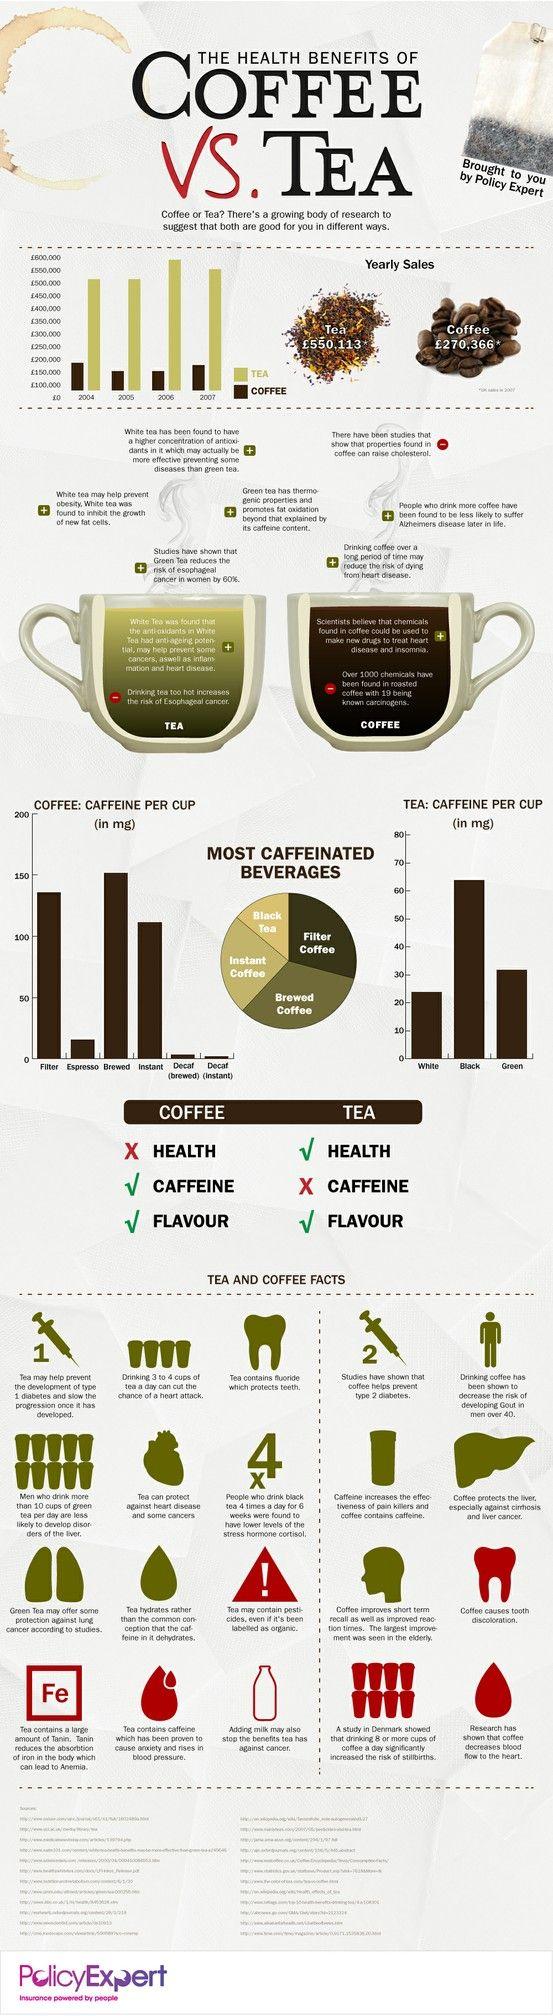 The Health Benefits of Coffee vs Tea Infographic